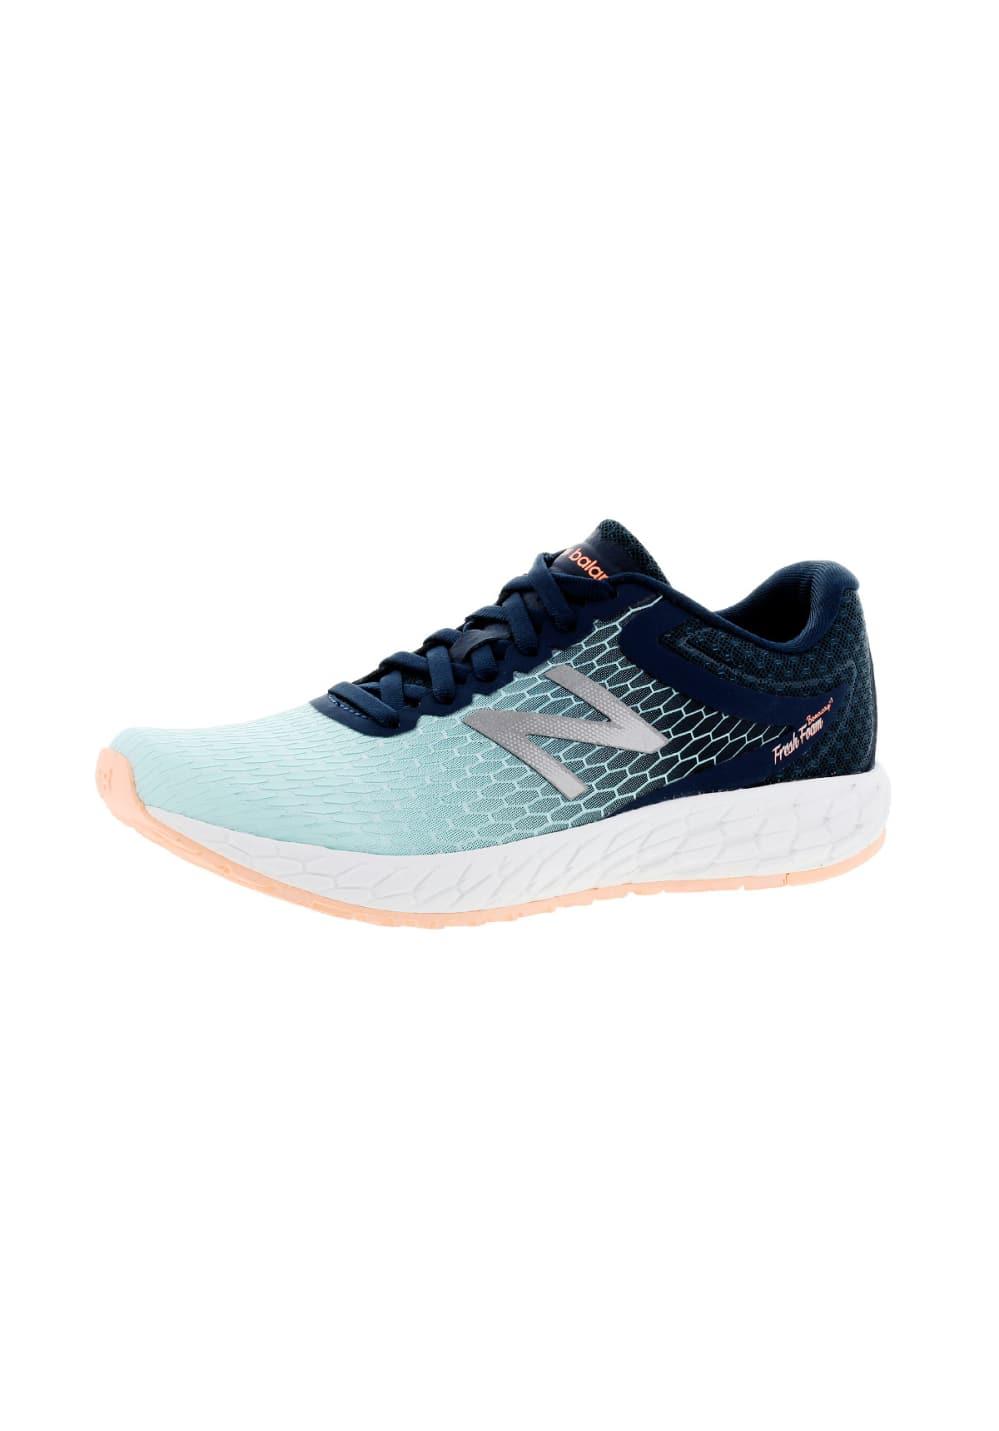 New Balance Fresh Foam Boracay V3 - Laufschuhe für Damen - Blau, Gr. 37